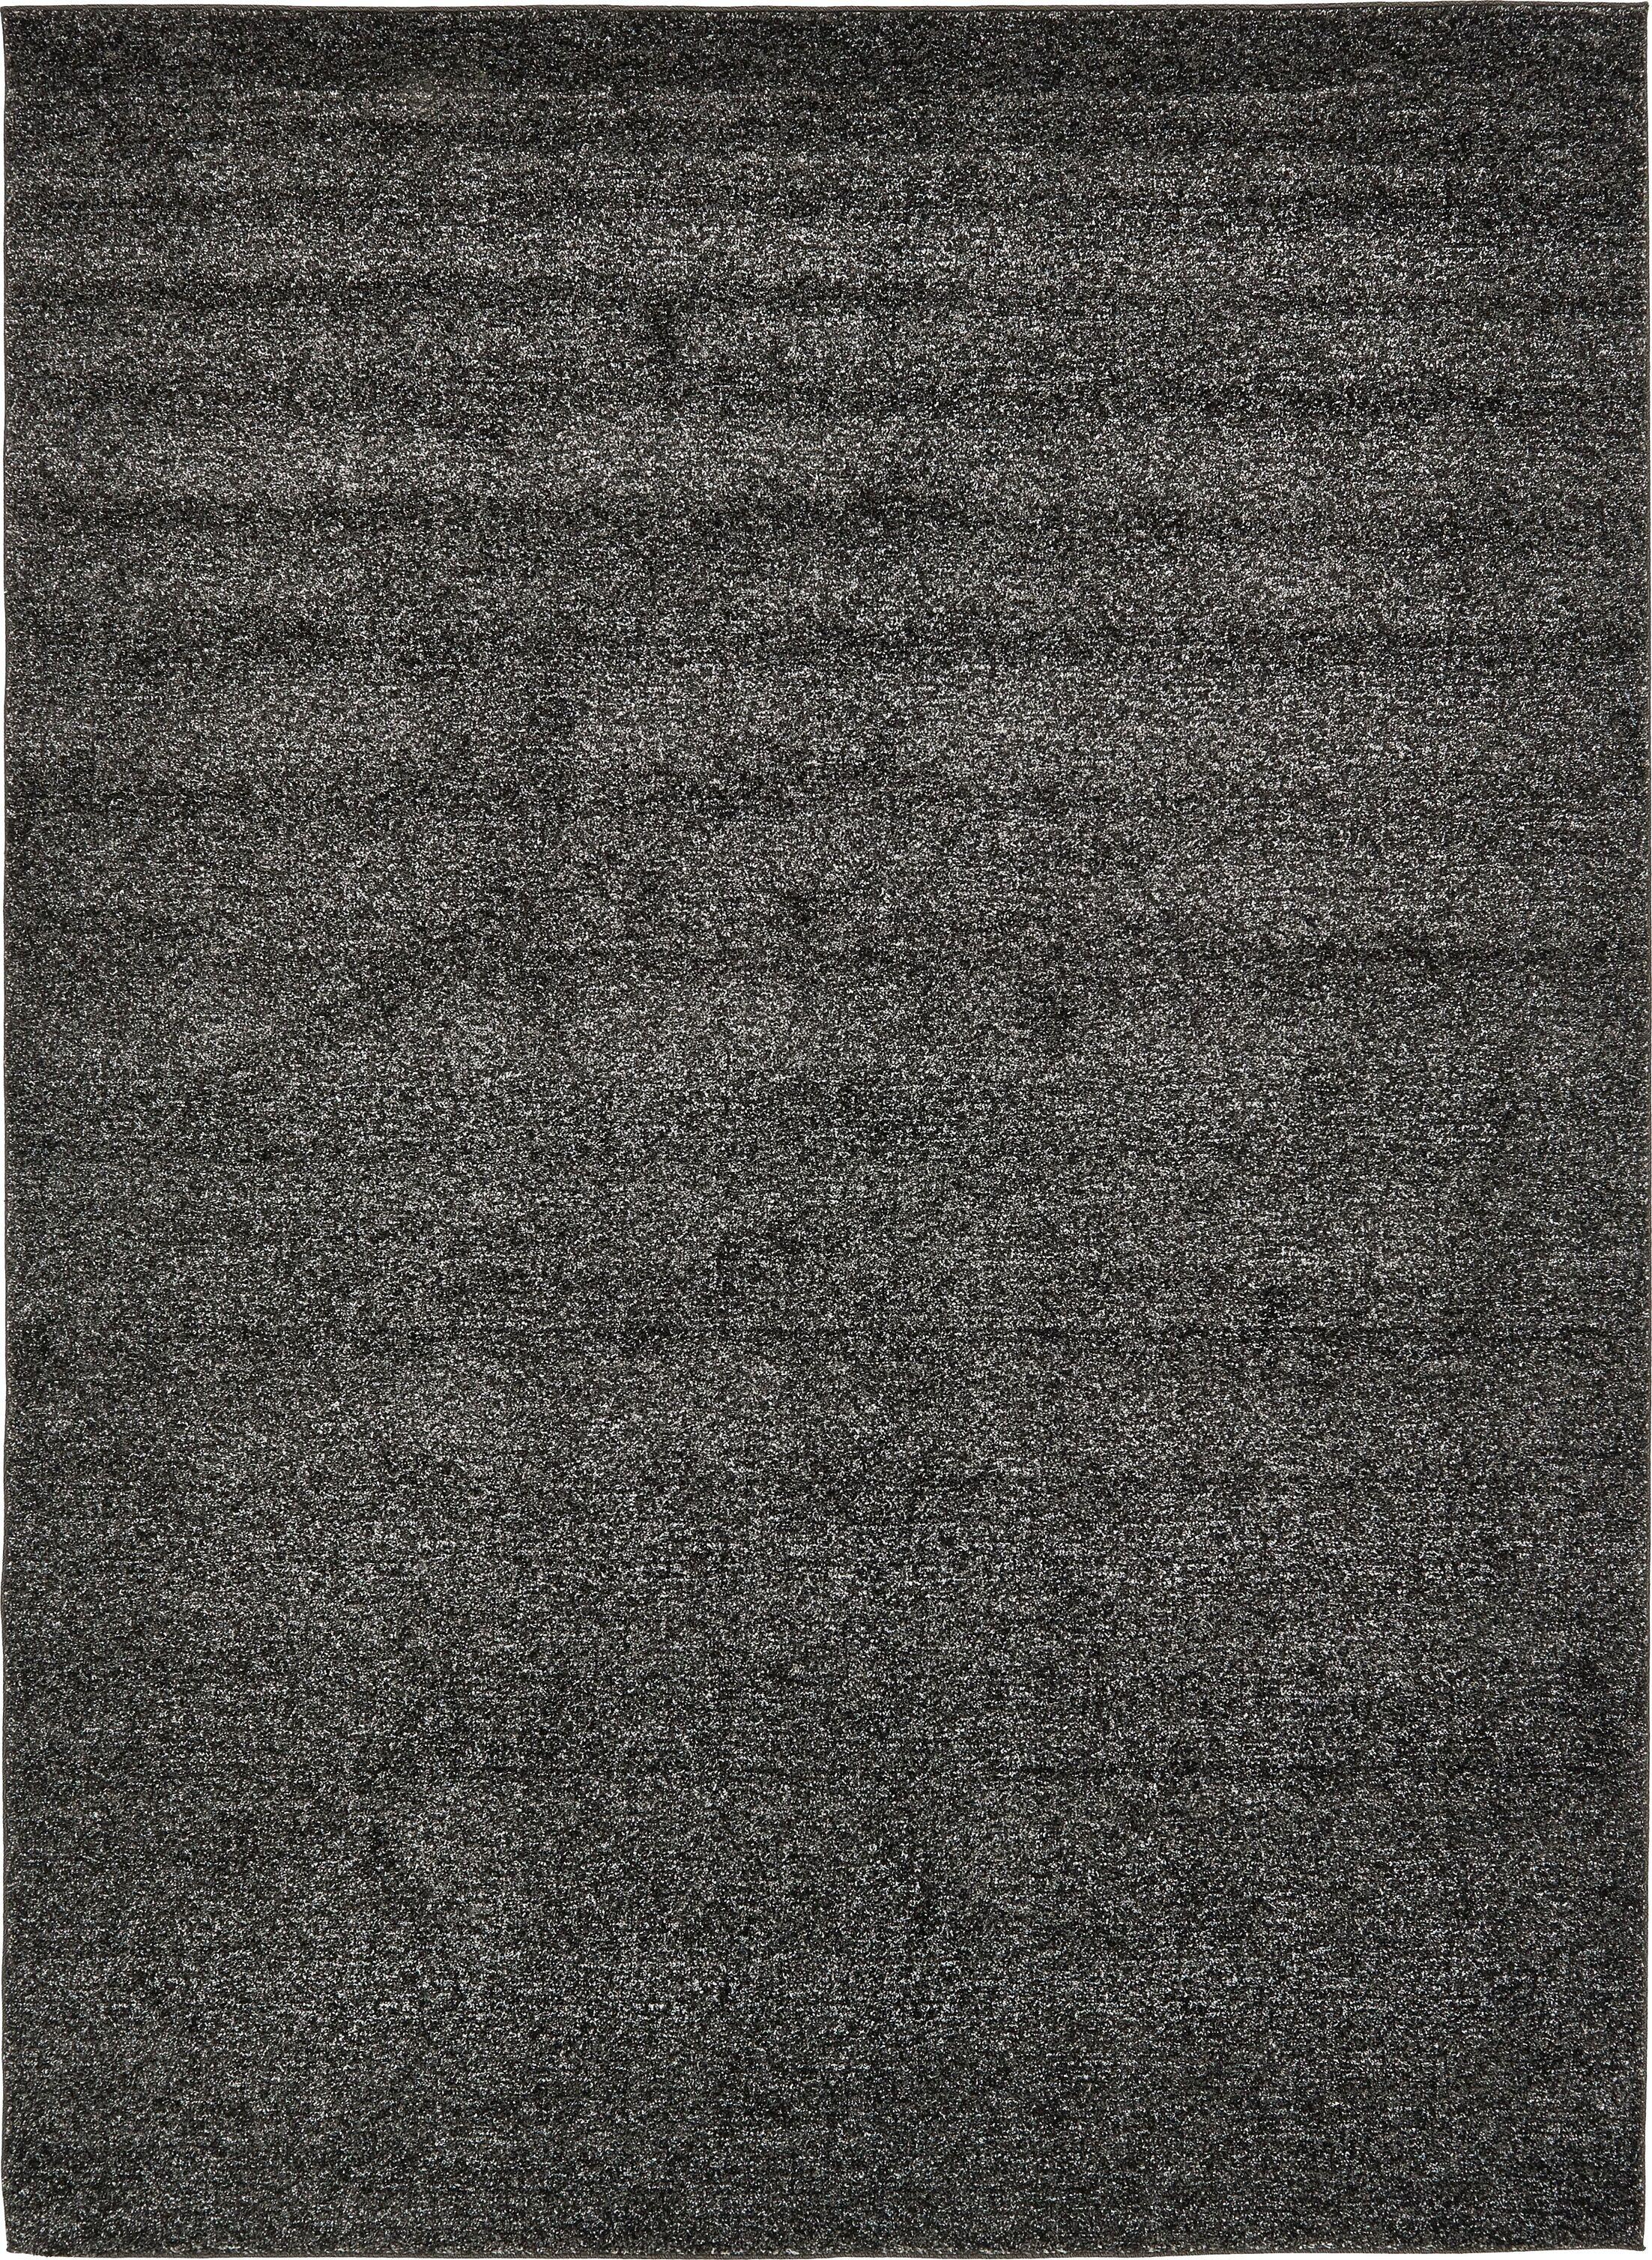 St Philips Marsh Black Area Rug Rug Size: Rectangle 10' x 13'